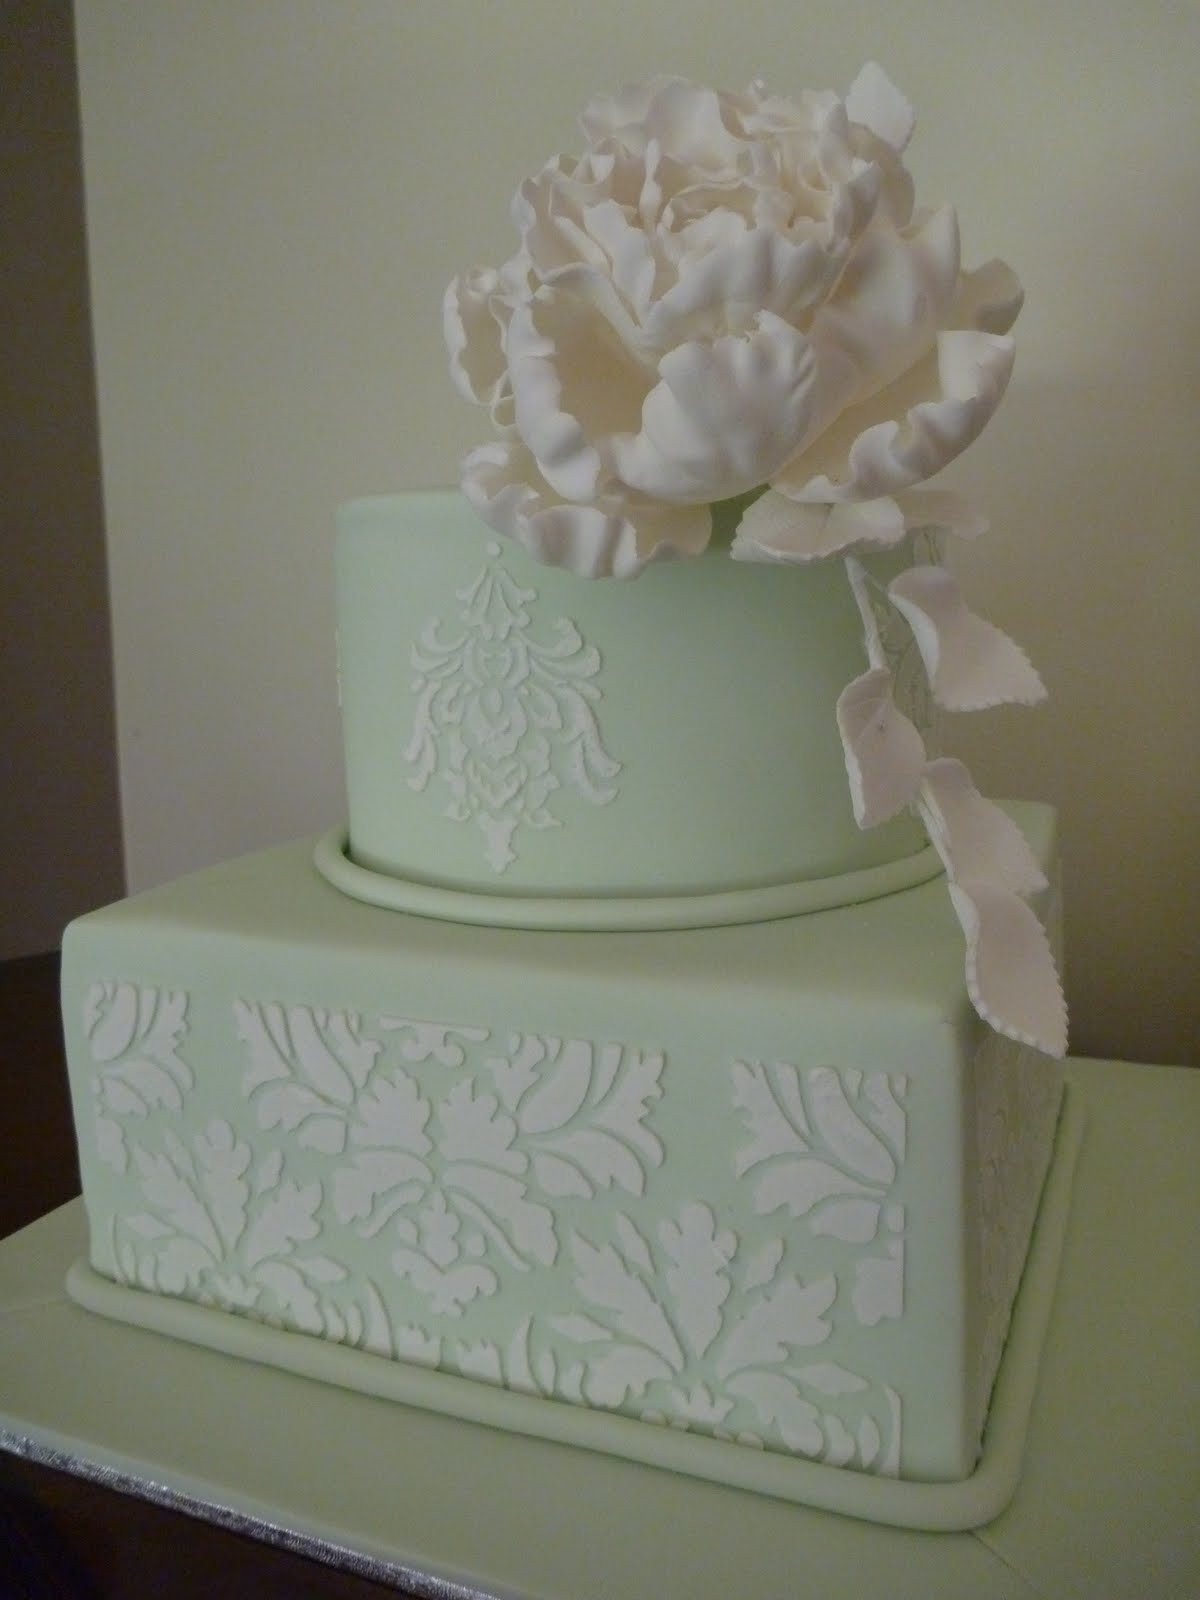 Wedding Cakes 2 Tier  Love Cake 2 Tier Wedding Cake with Stencil and Sugar